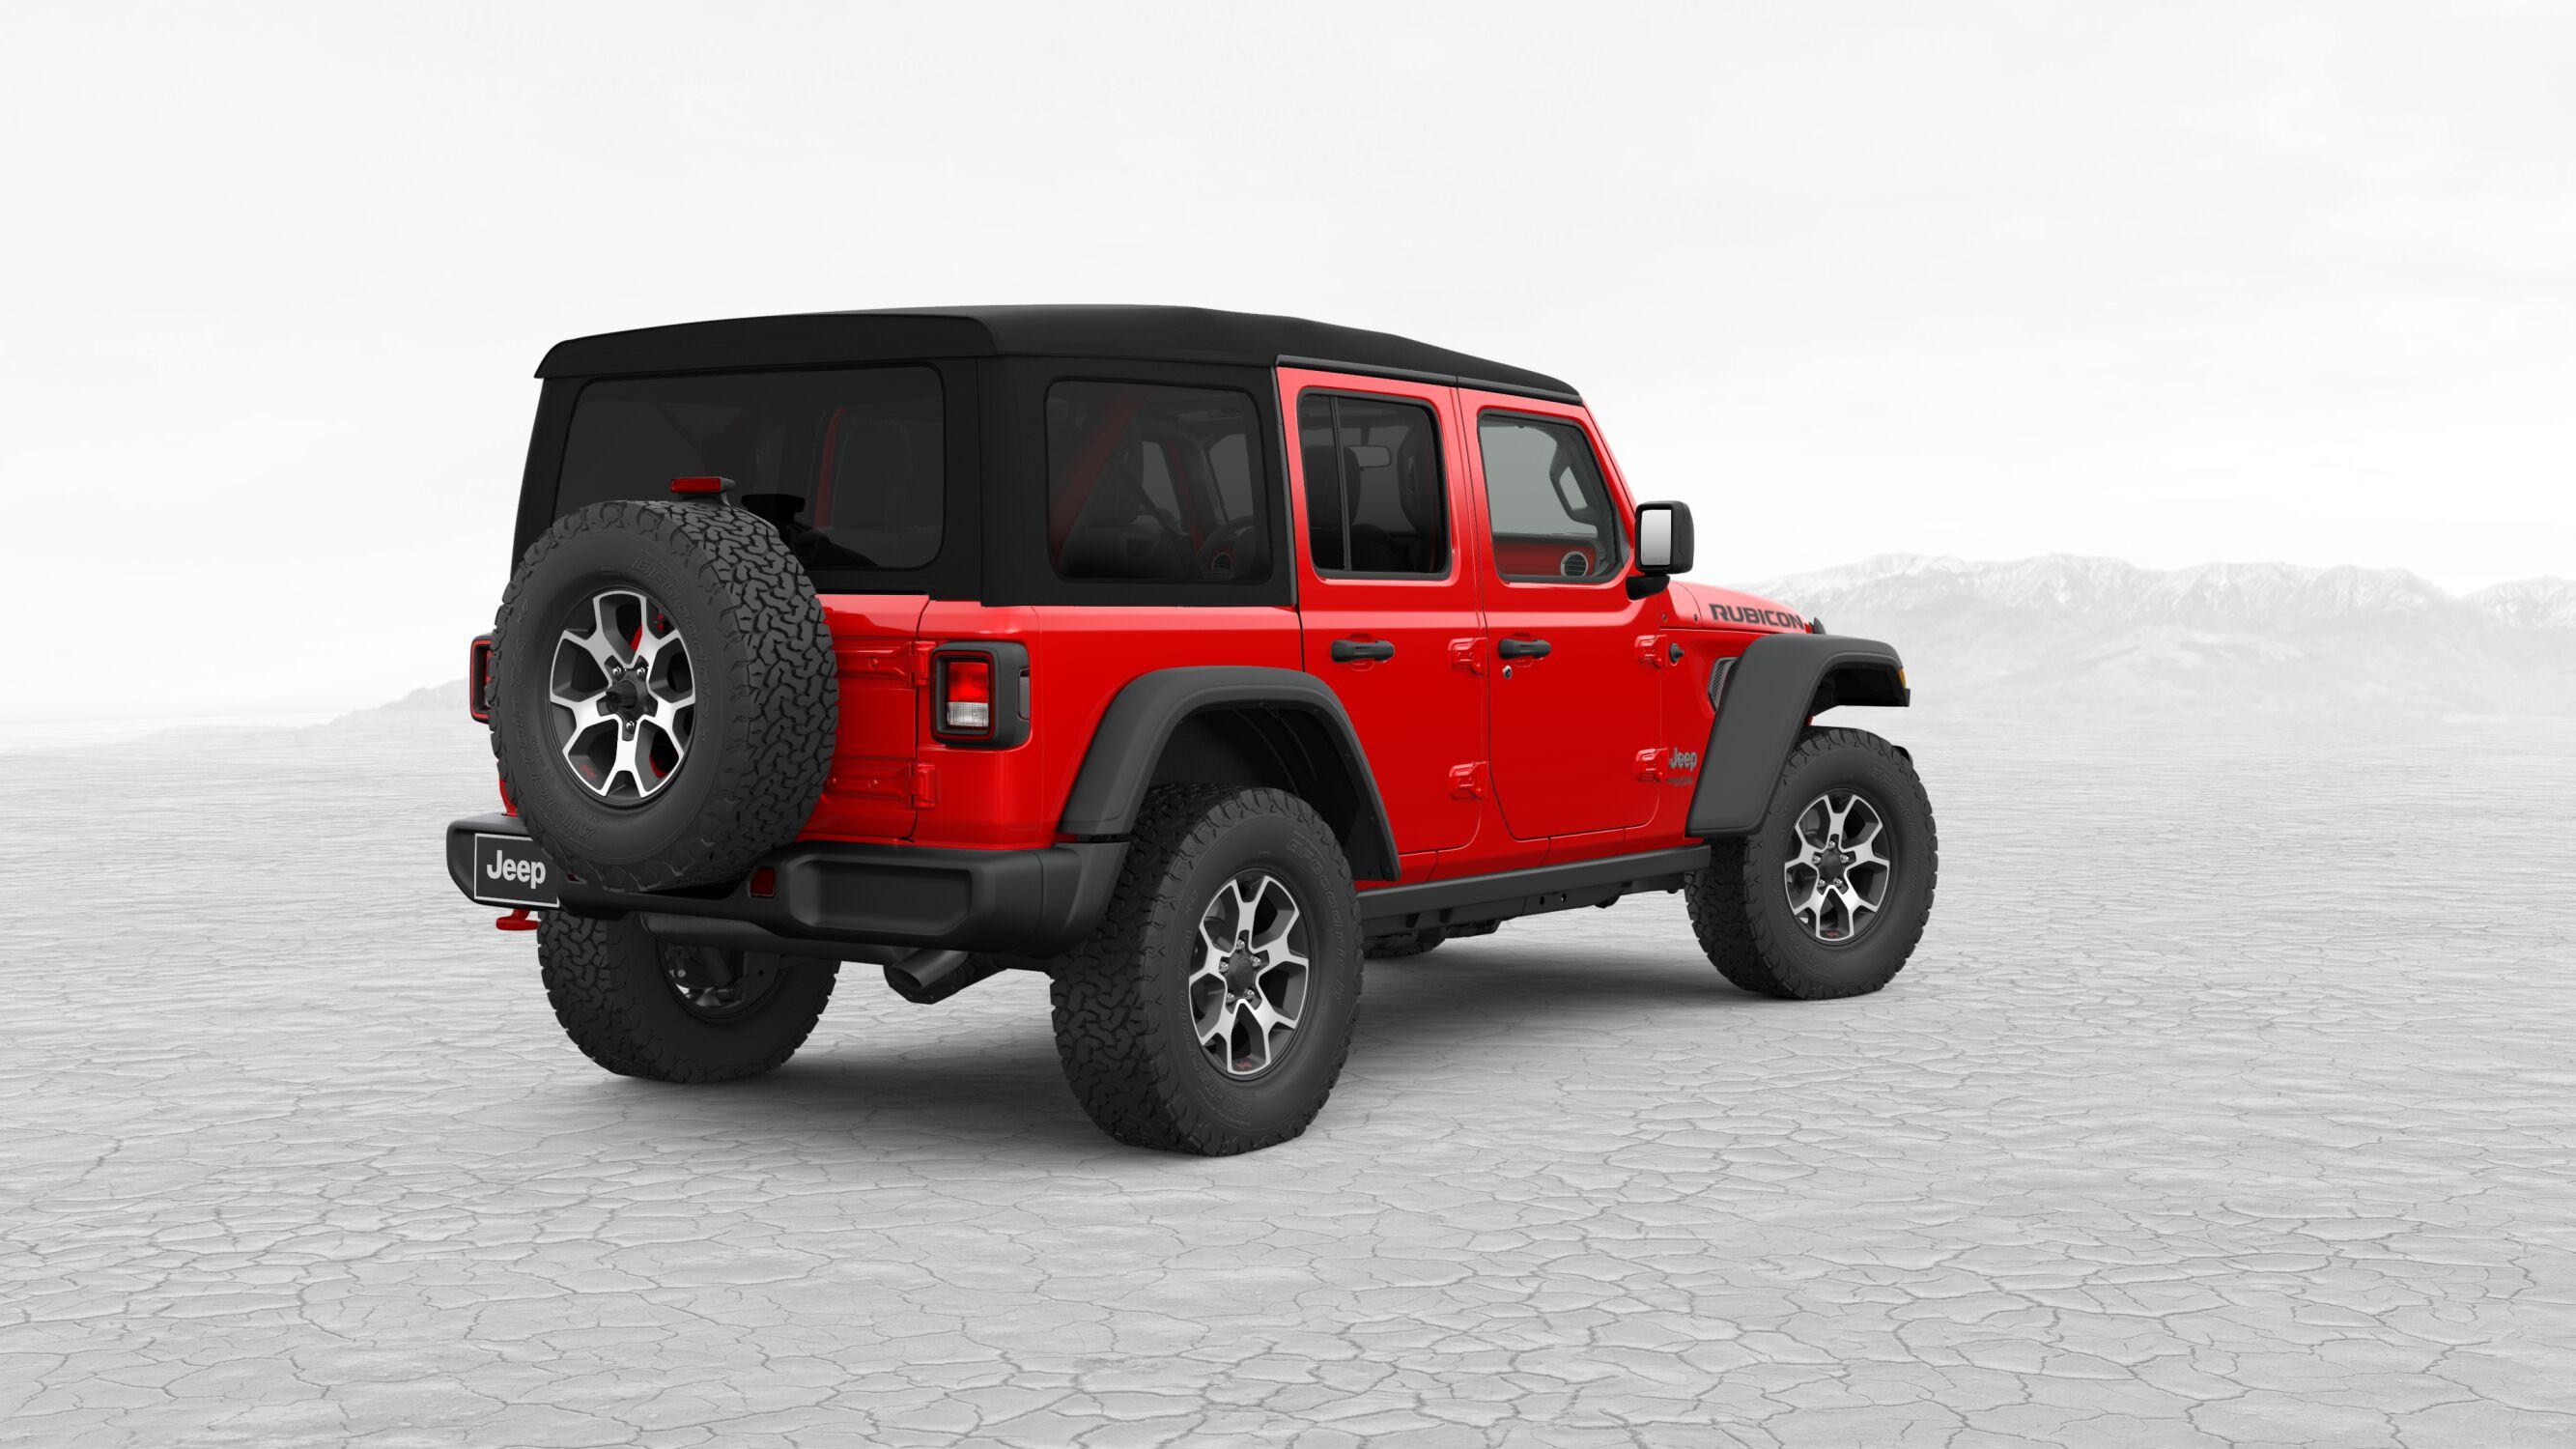 Wilson Motors Corvallis >> 2018 Jeep Wrangler JL Unlimited Rubicon | Wilson Motors ...